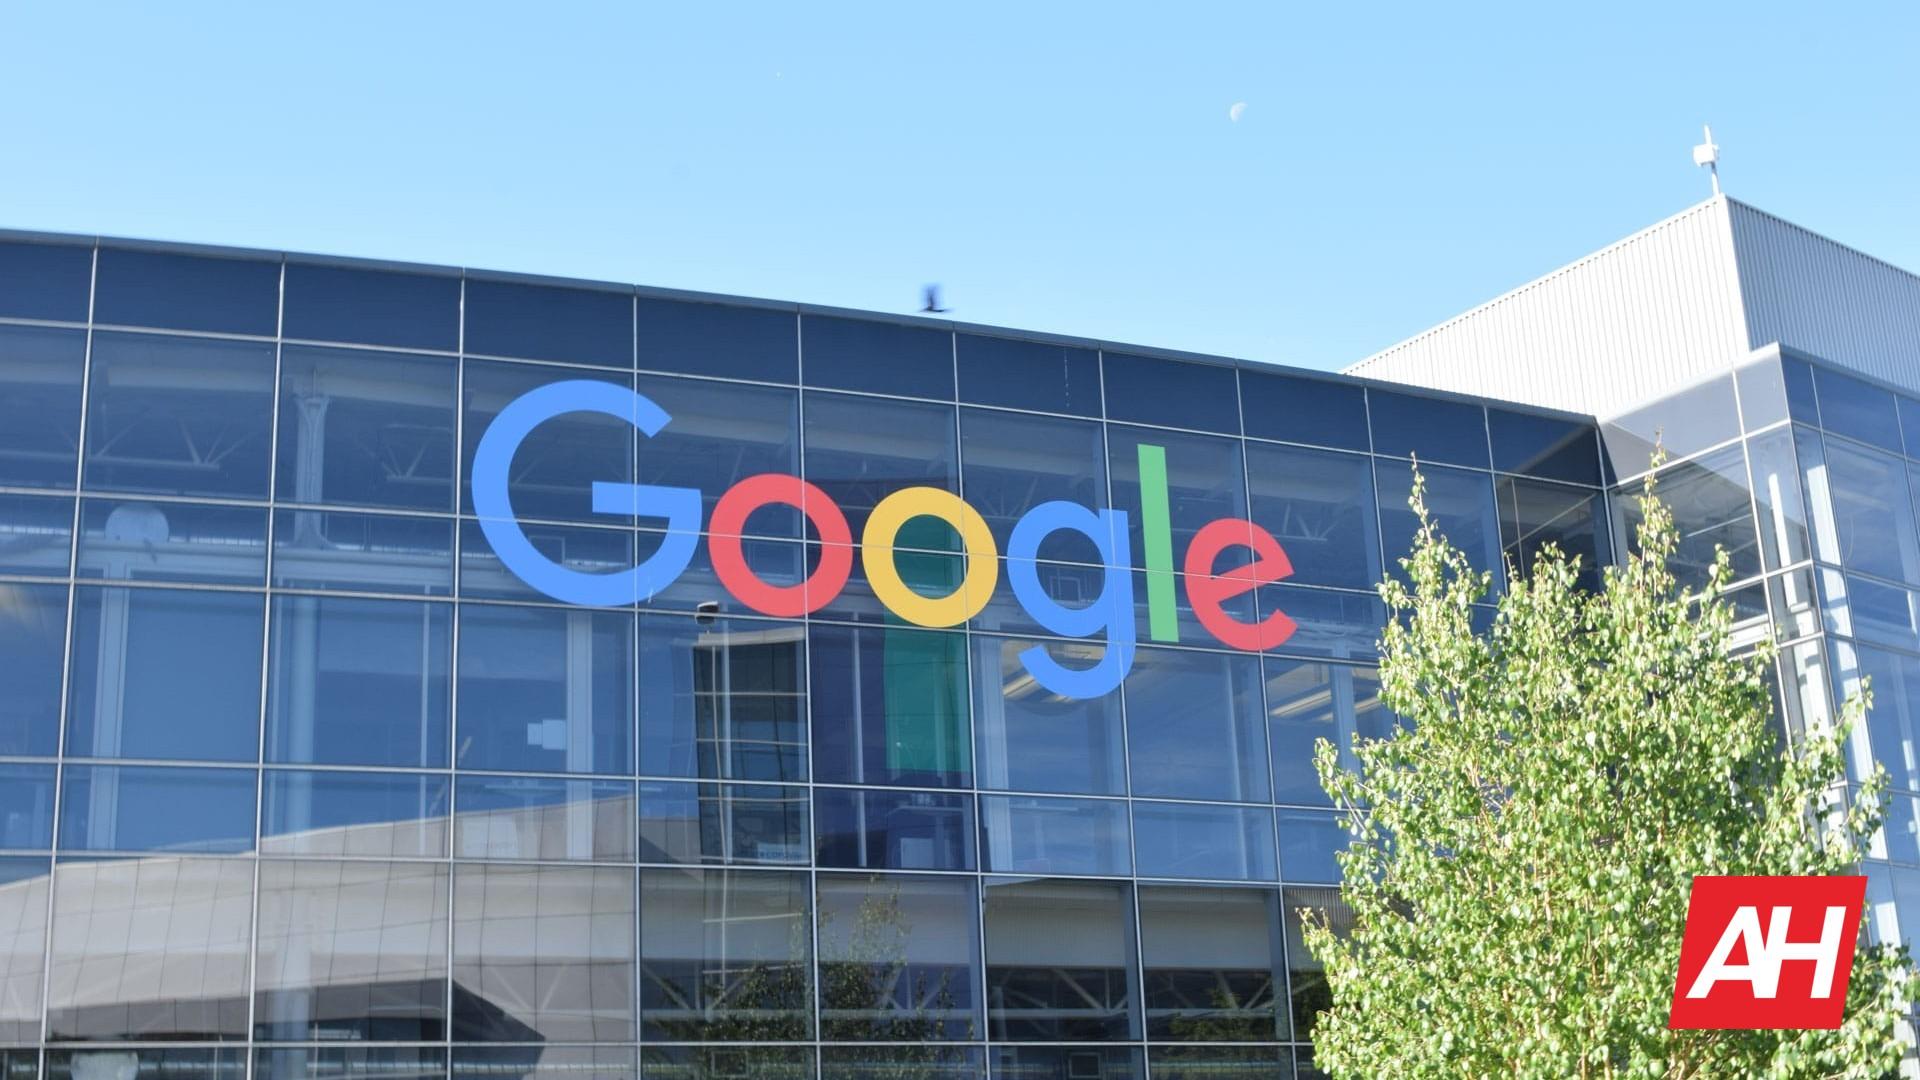 Google Legally Sent $23B To Bermuda To Avoid Taxes